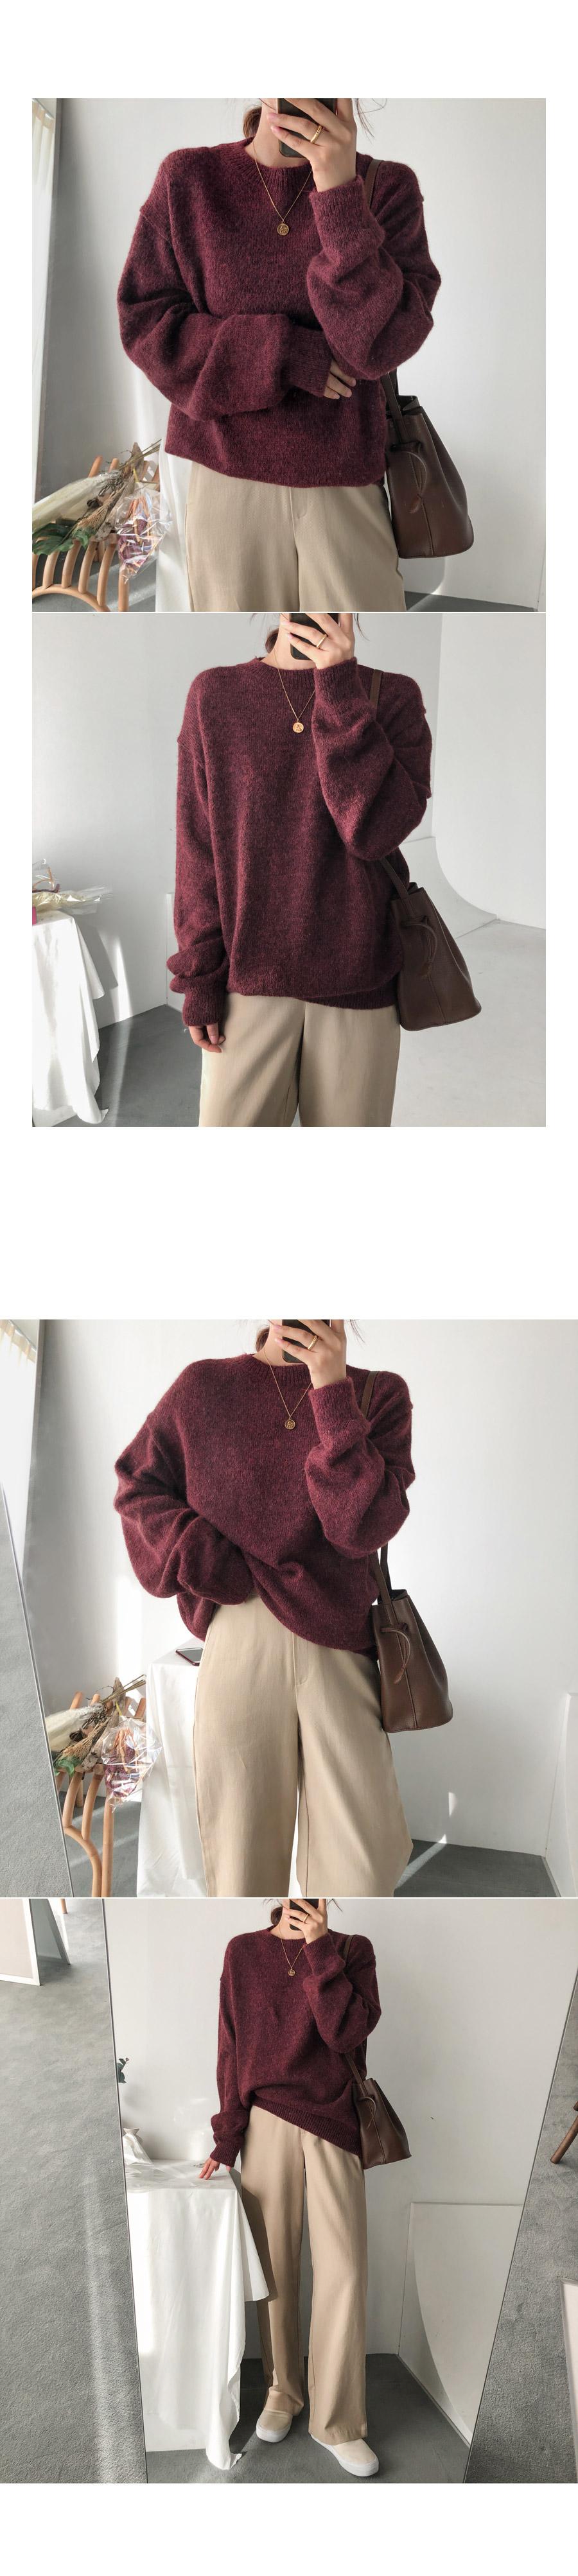 Rickle knit